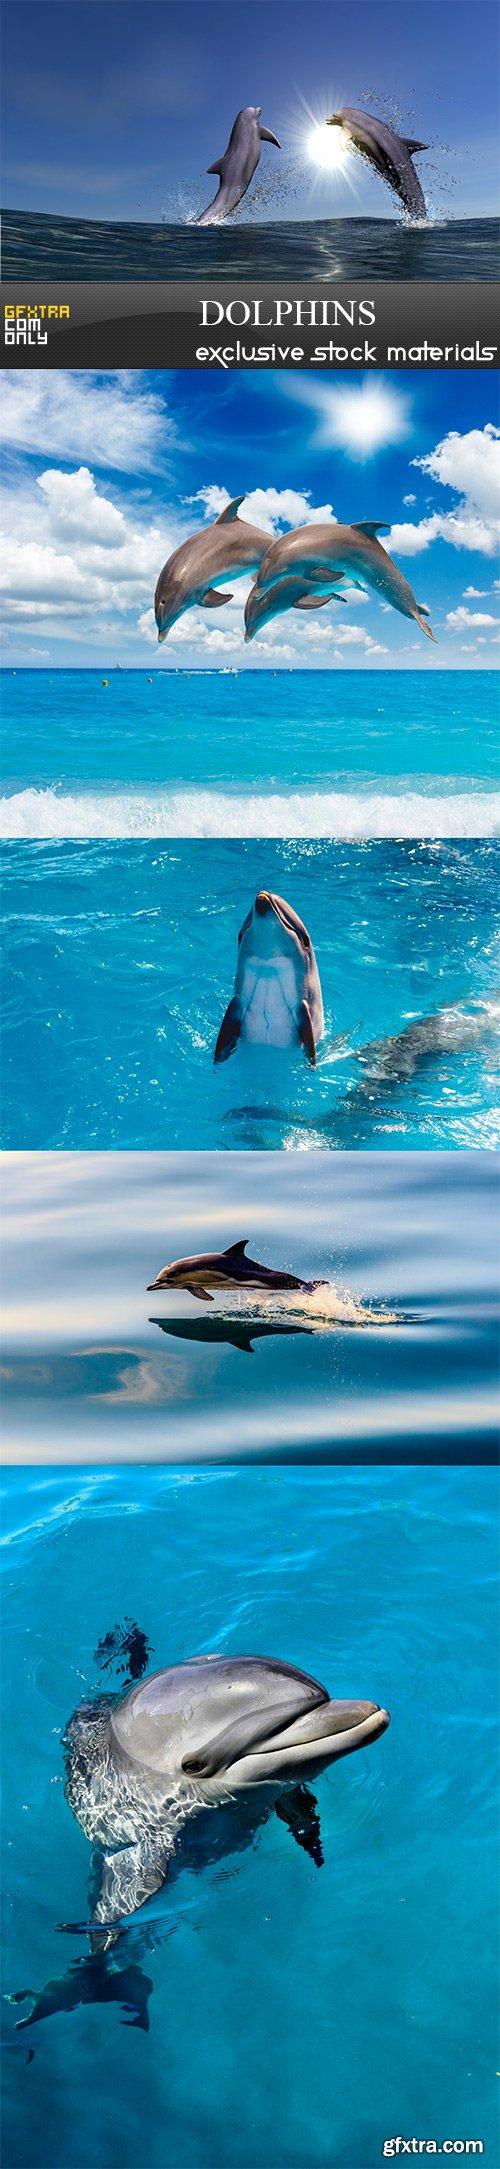 Dolphins - 5UHQ JPEG